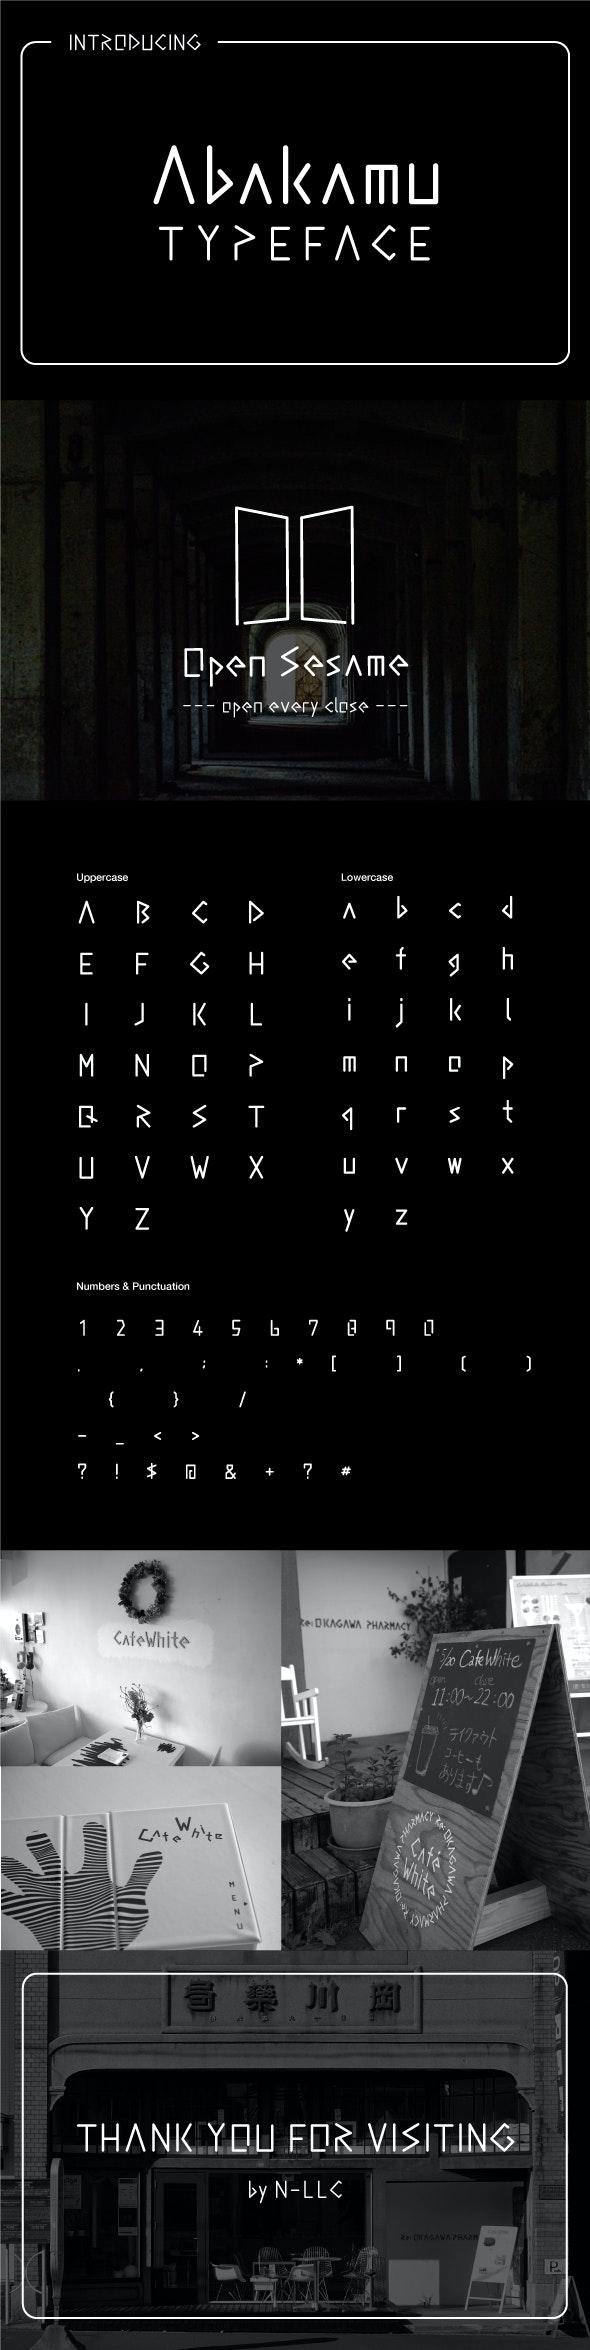 Abakamu - Sans-Serif Fonts